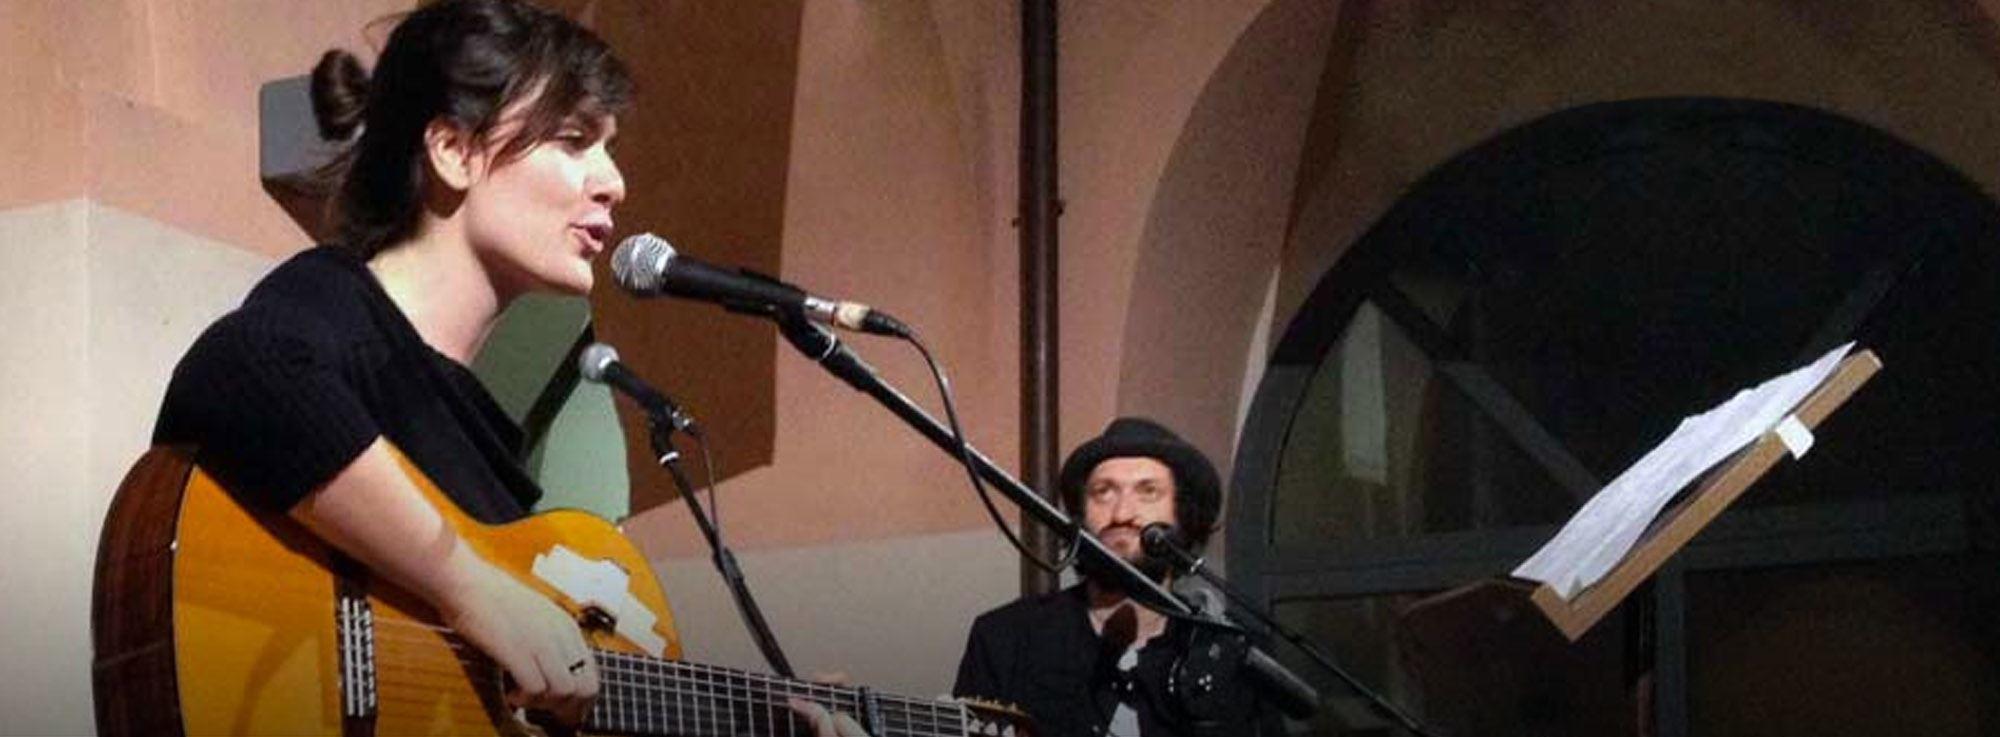 Trani: Erica Mou e Cosimo damiano Damato